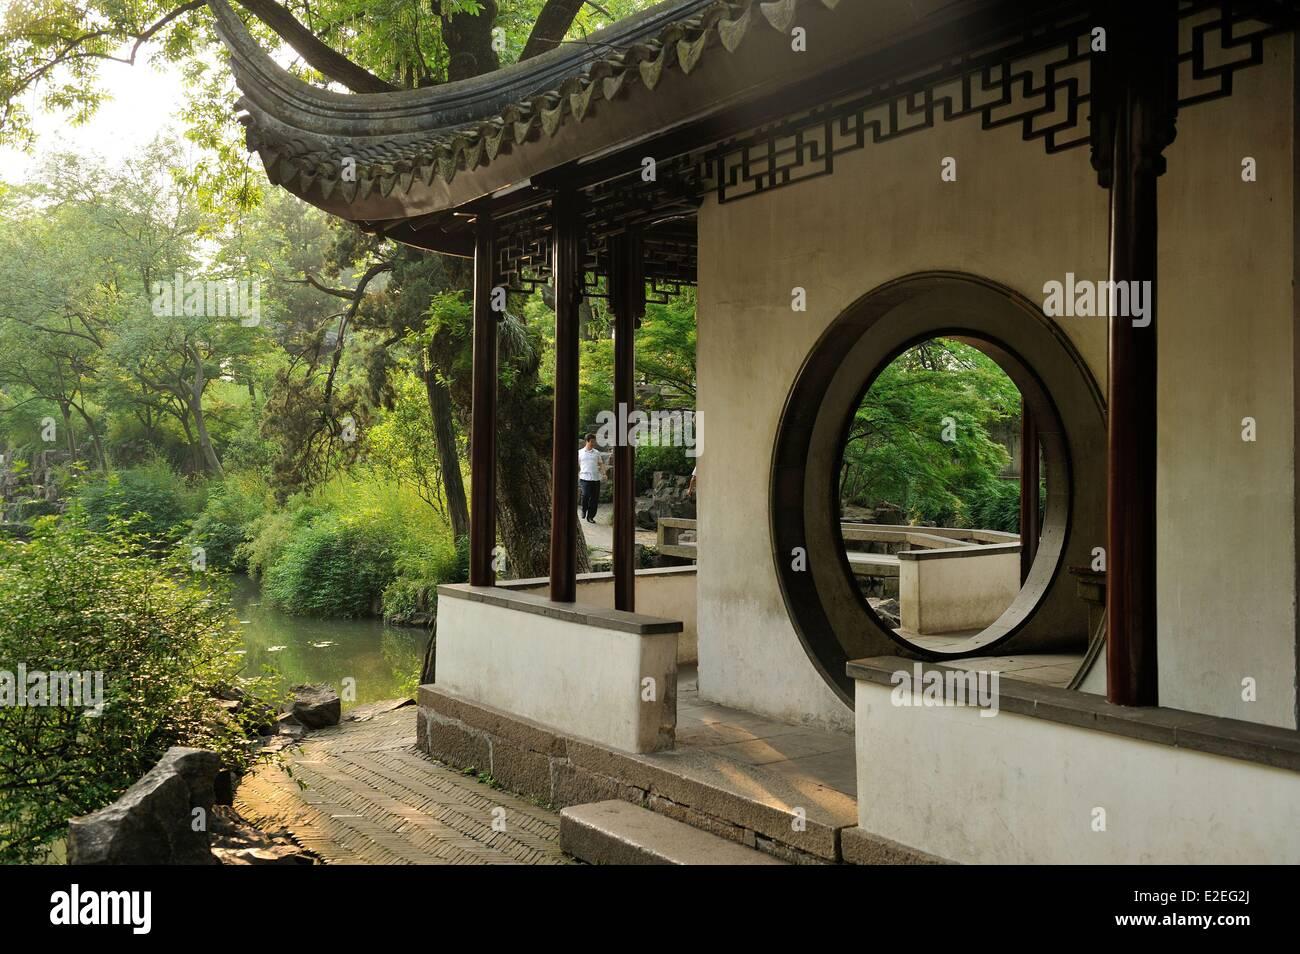 La Chine, la province de Jiangsu, Suzhou, l'Humble Administrator's garden classé au Patrimoine Mondial Photo Stock